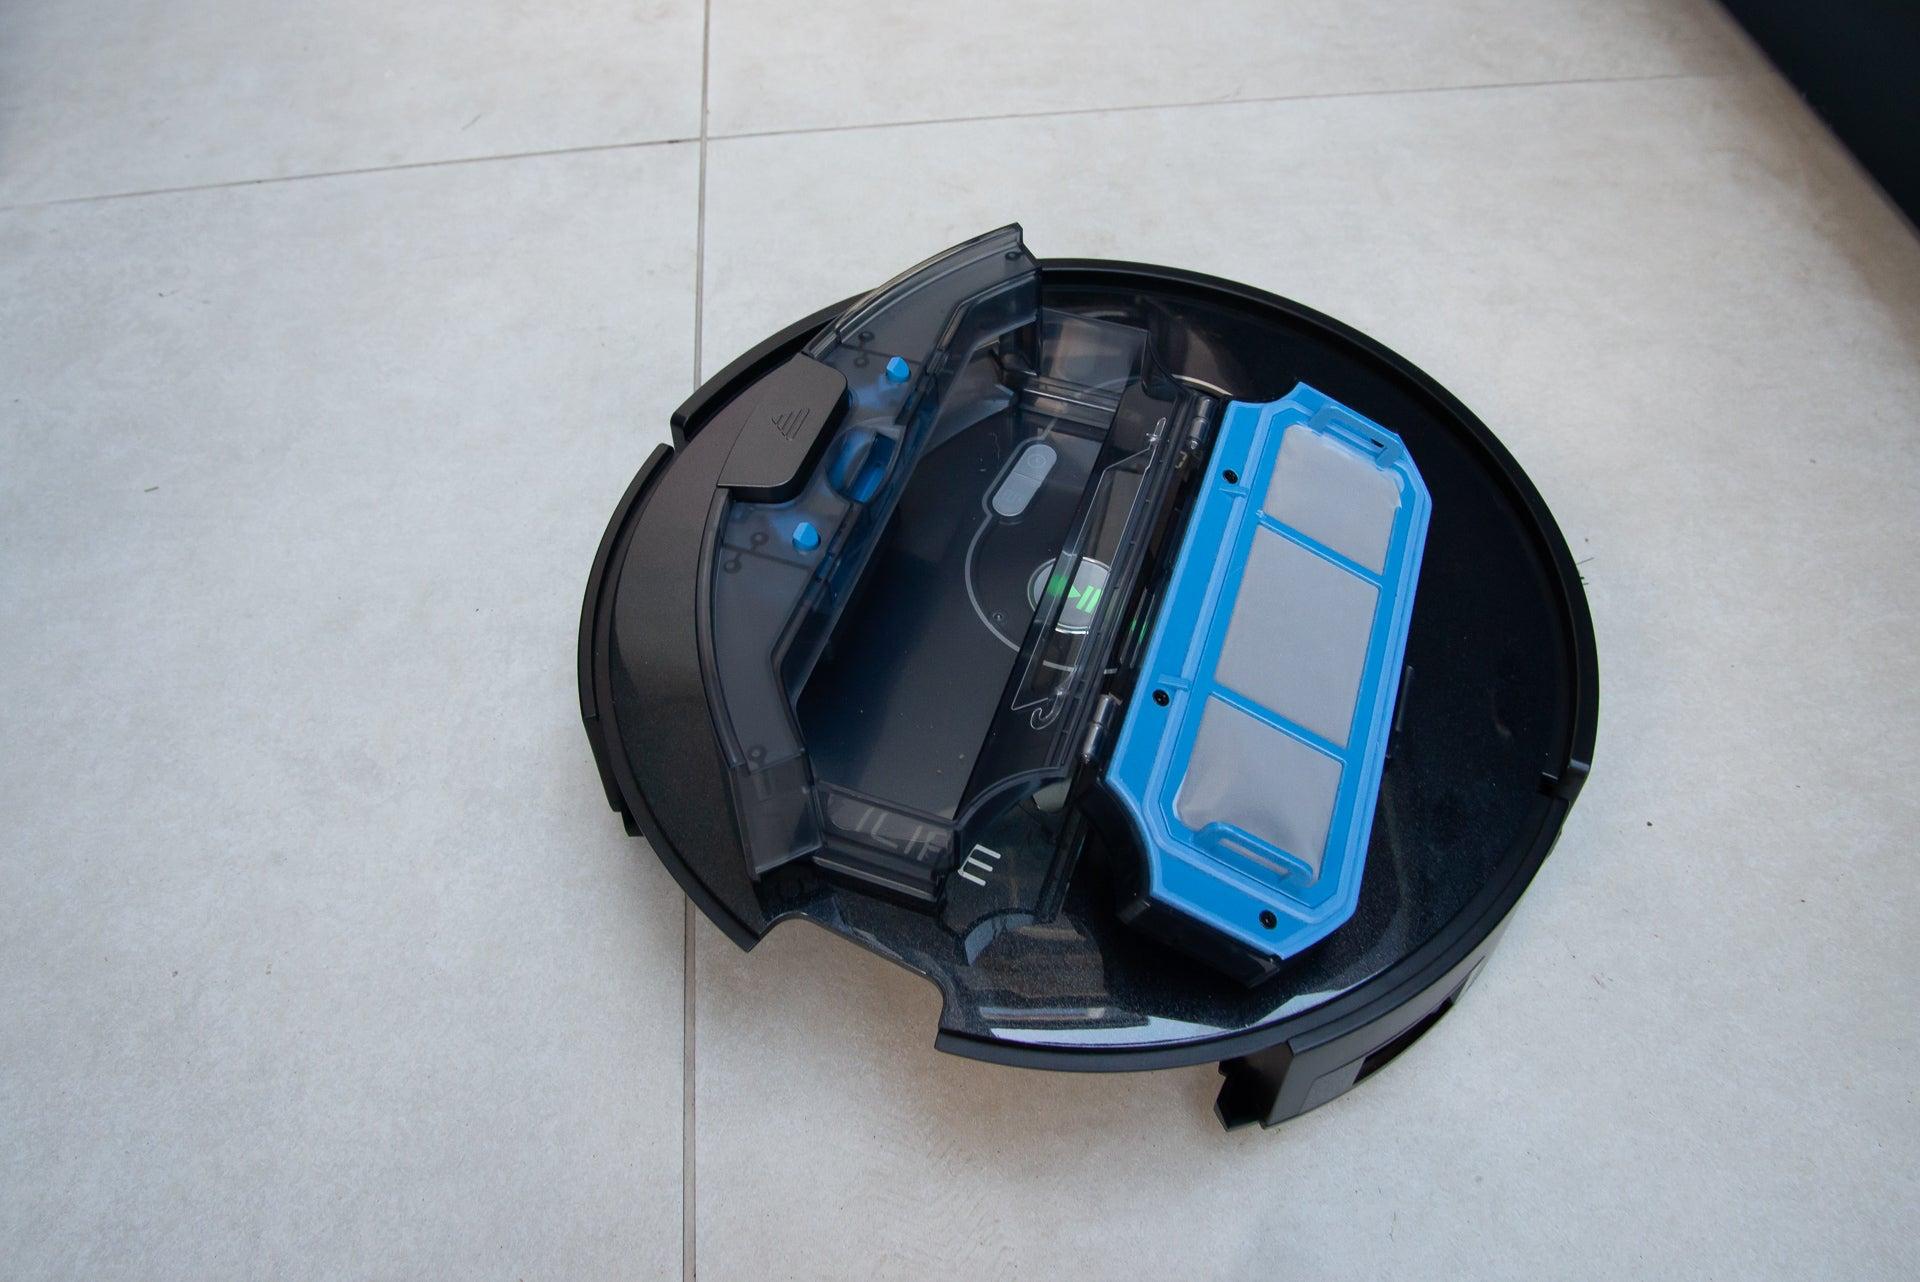 iLife A7 Robotic Vacuum Cleaner bin